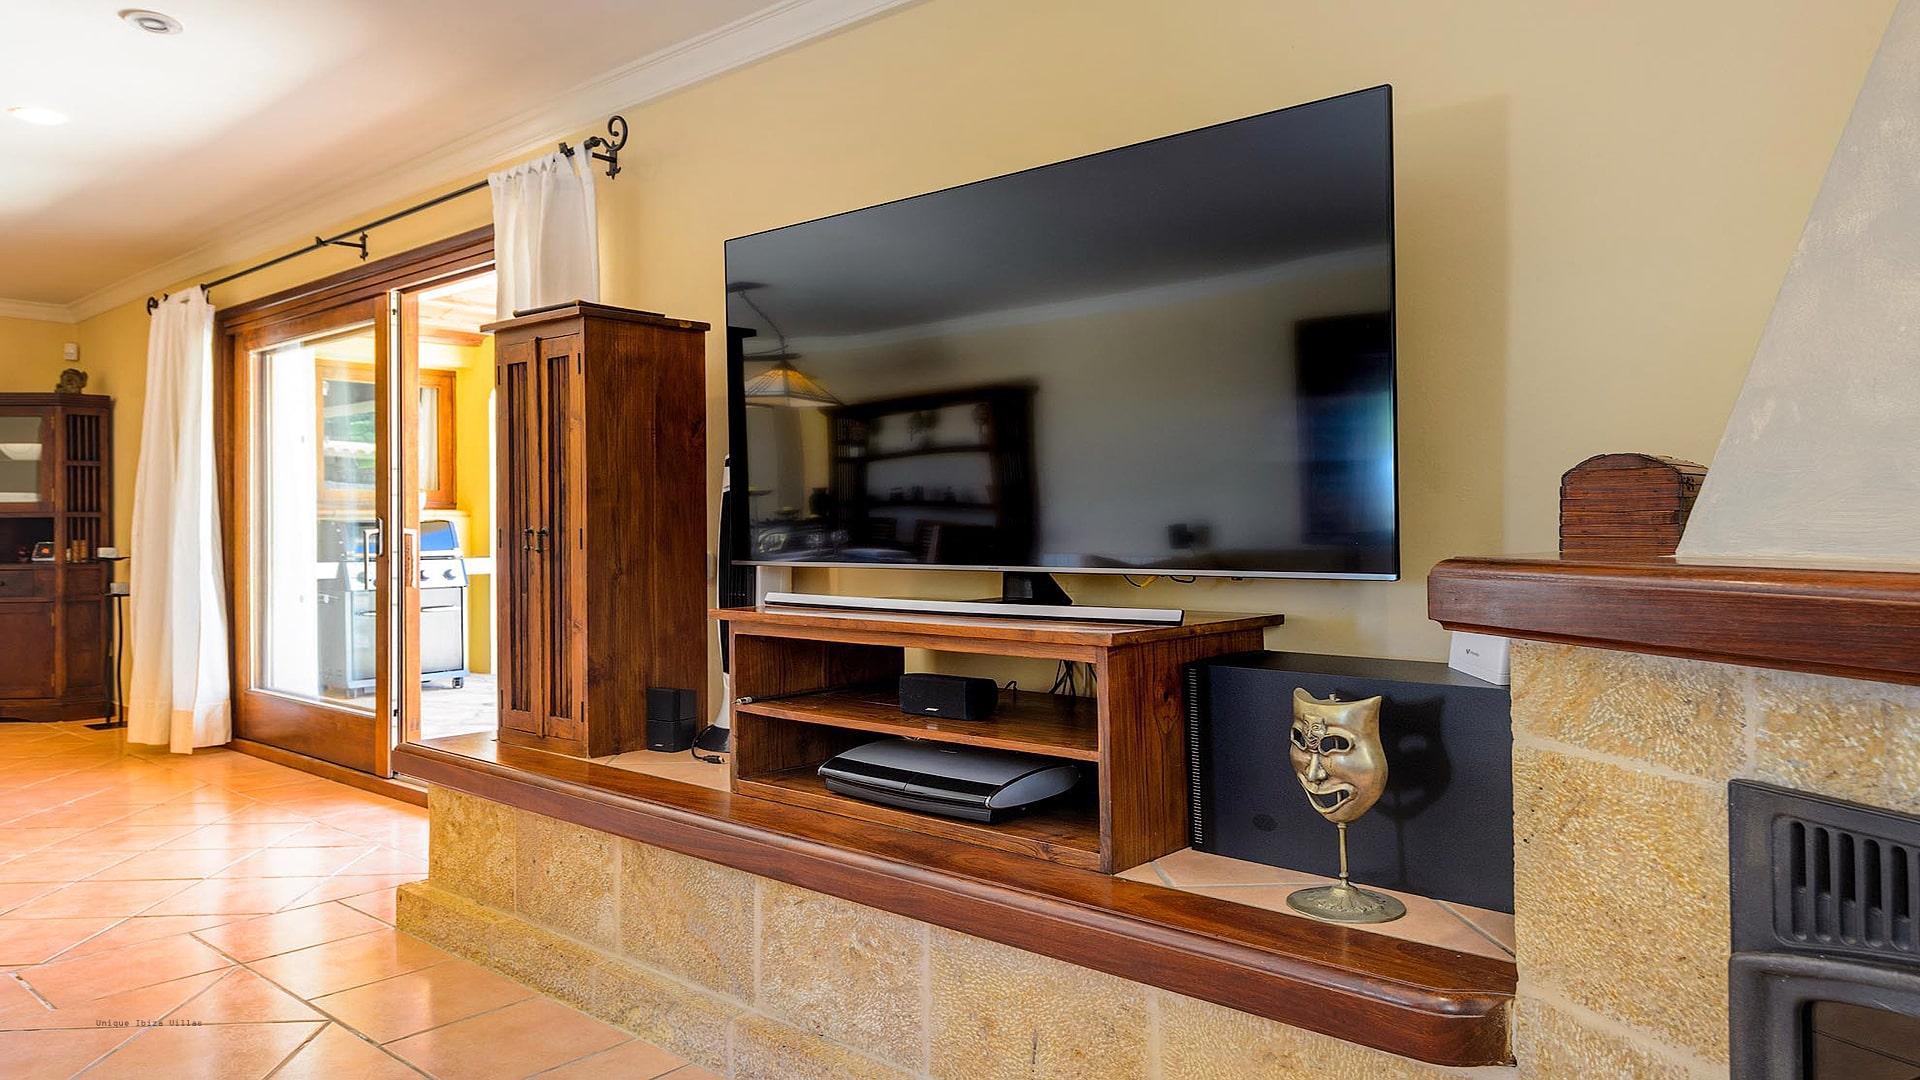 Casa Beni Ibiza 26 Santa Eulalia